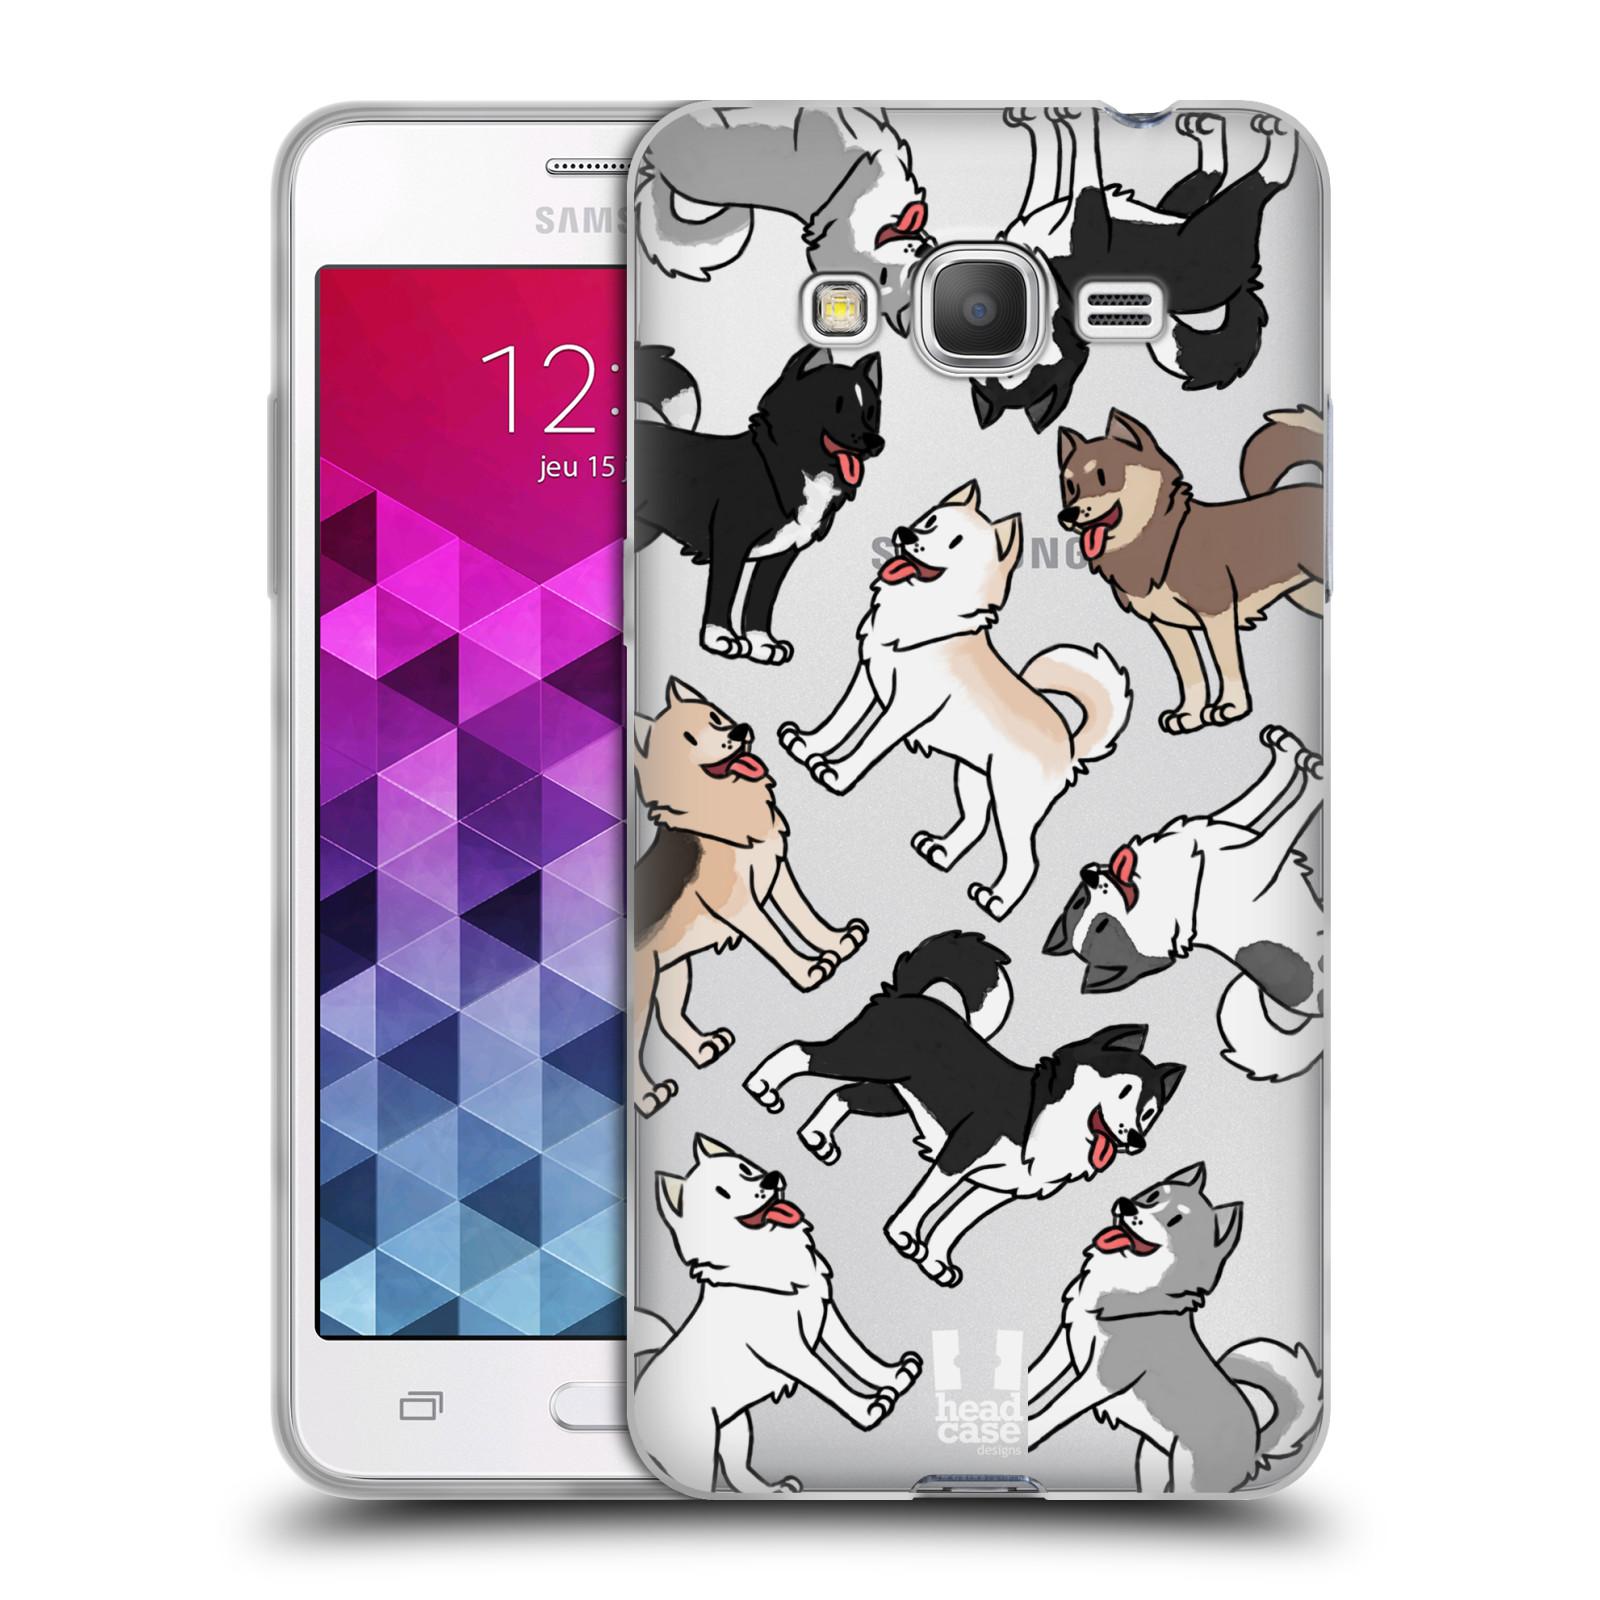 HEAD CASE silikonový obal na mobil Samsung Galaxy Grand Prime pejsek Sibiřský husky